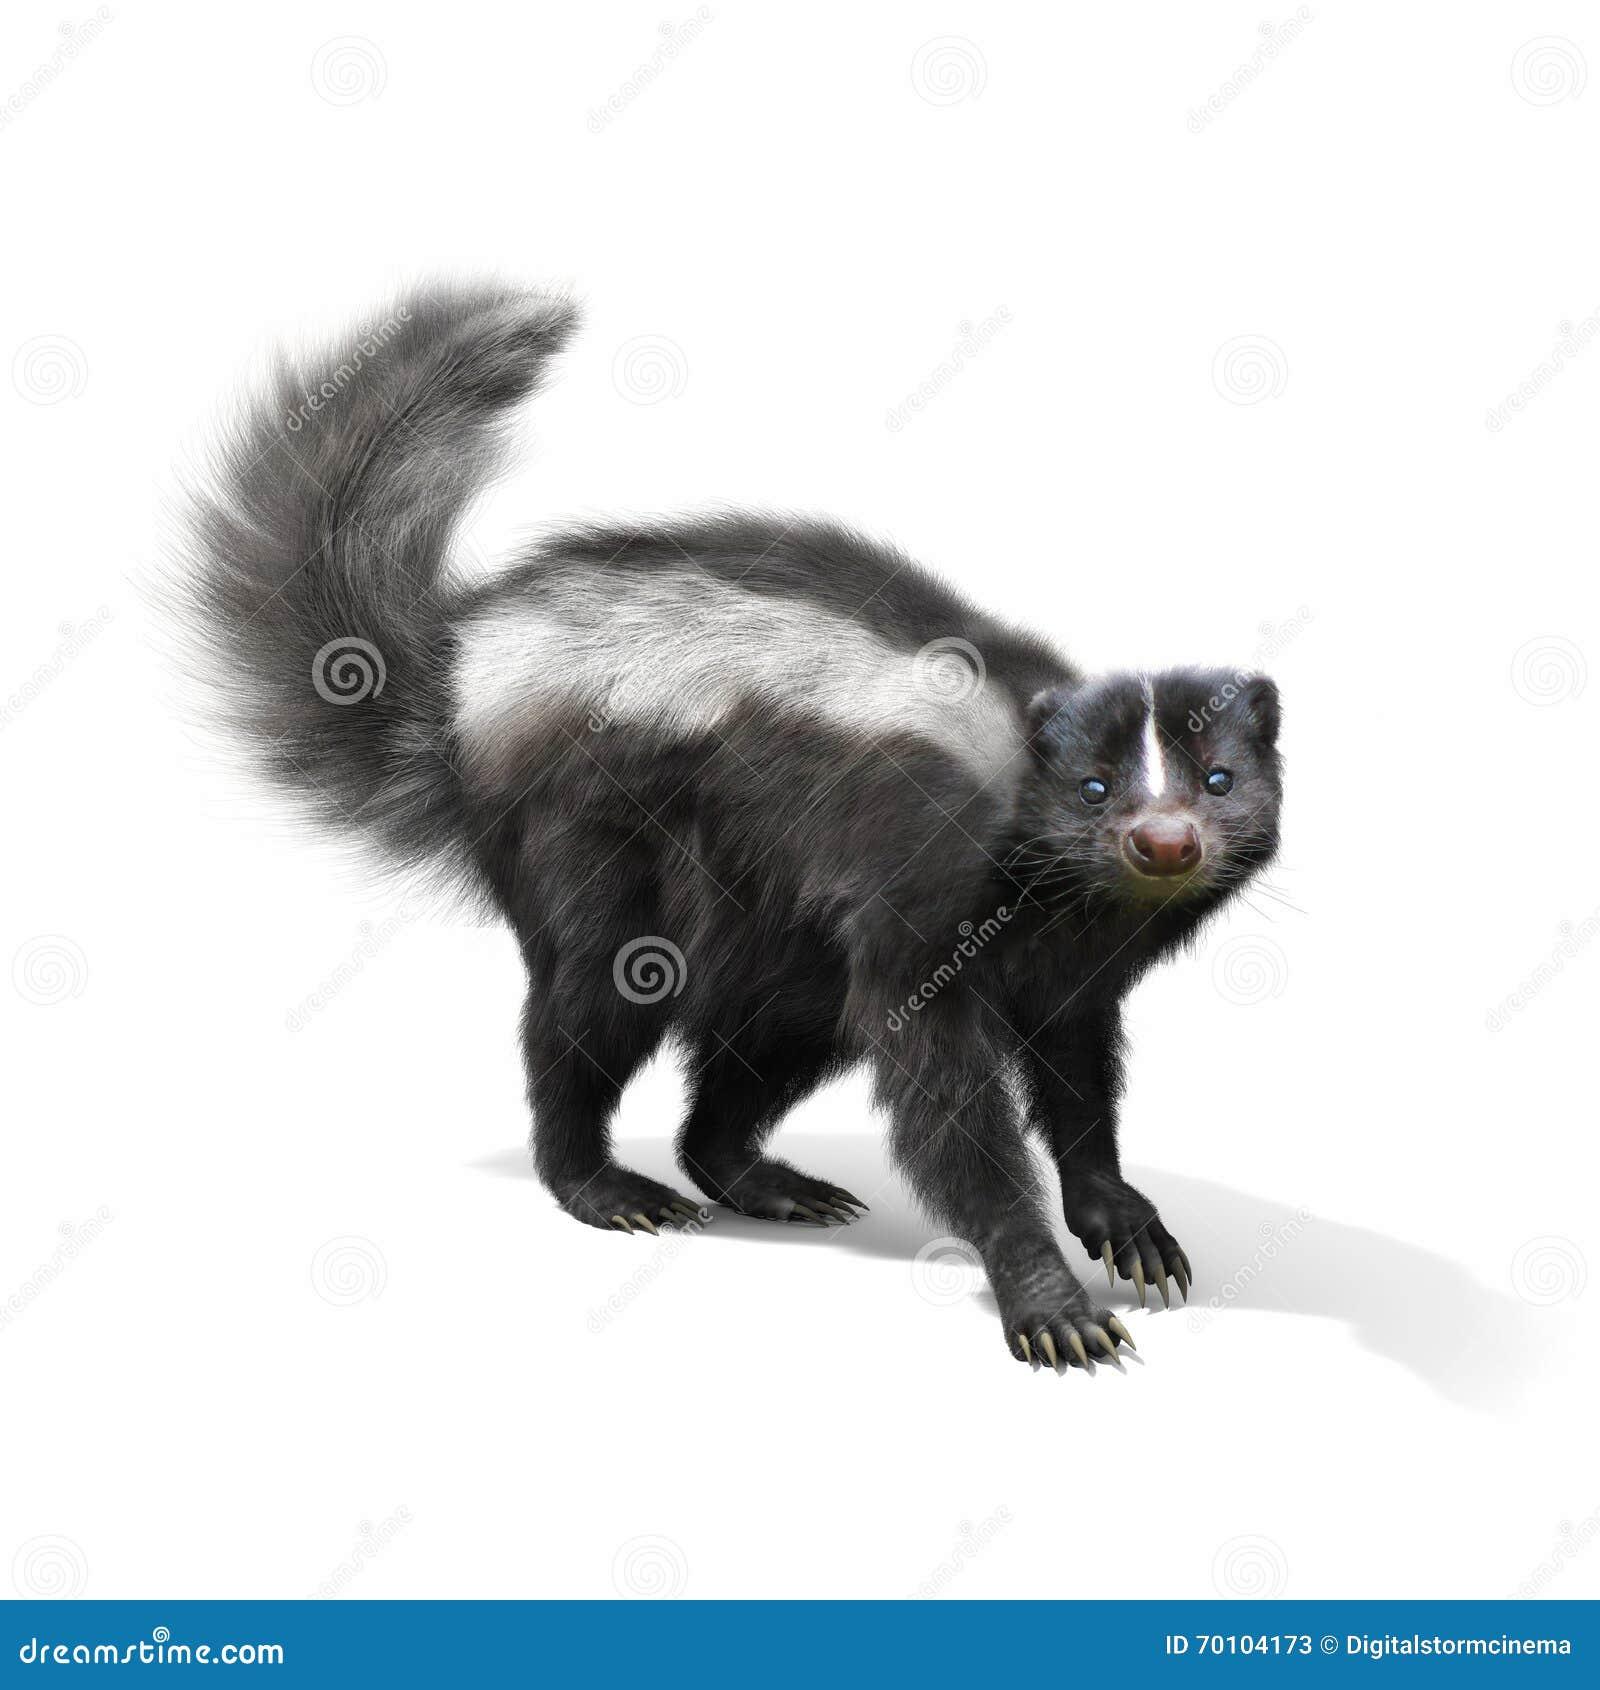 skunk on a white background stock illustration image 70104173